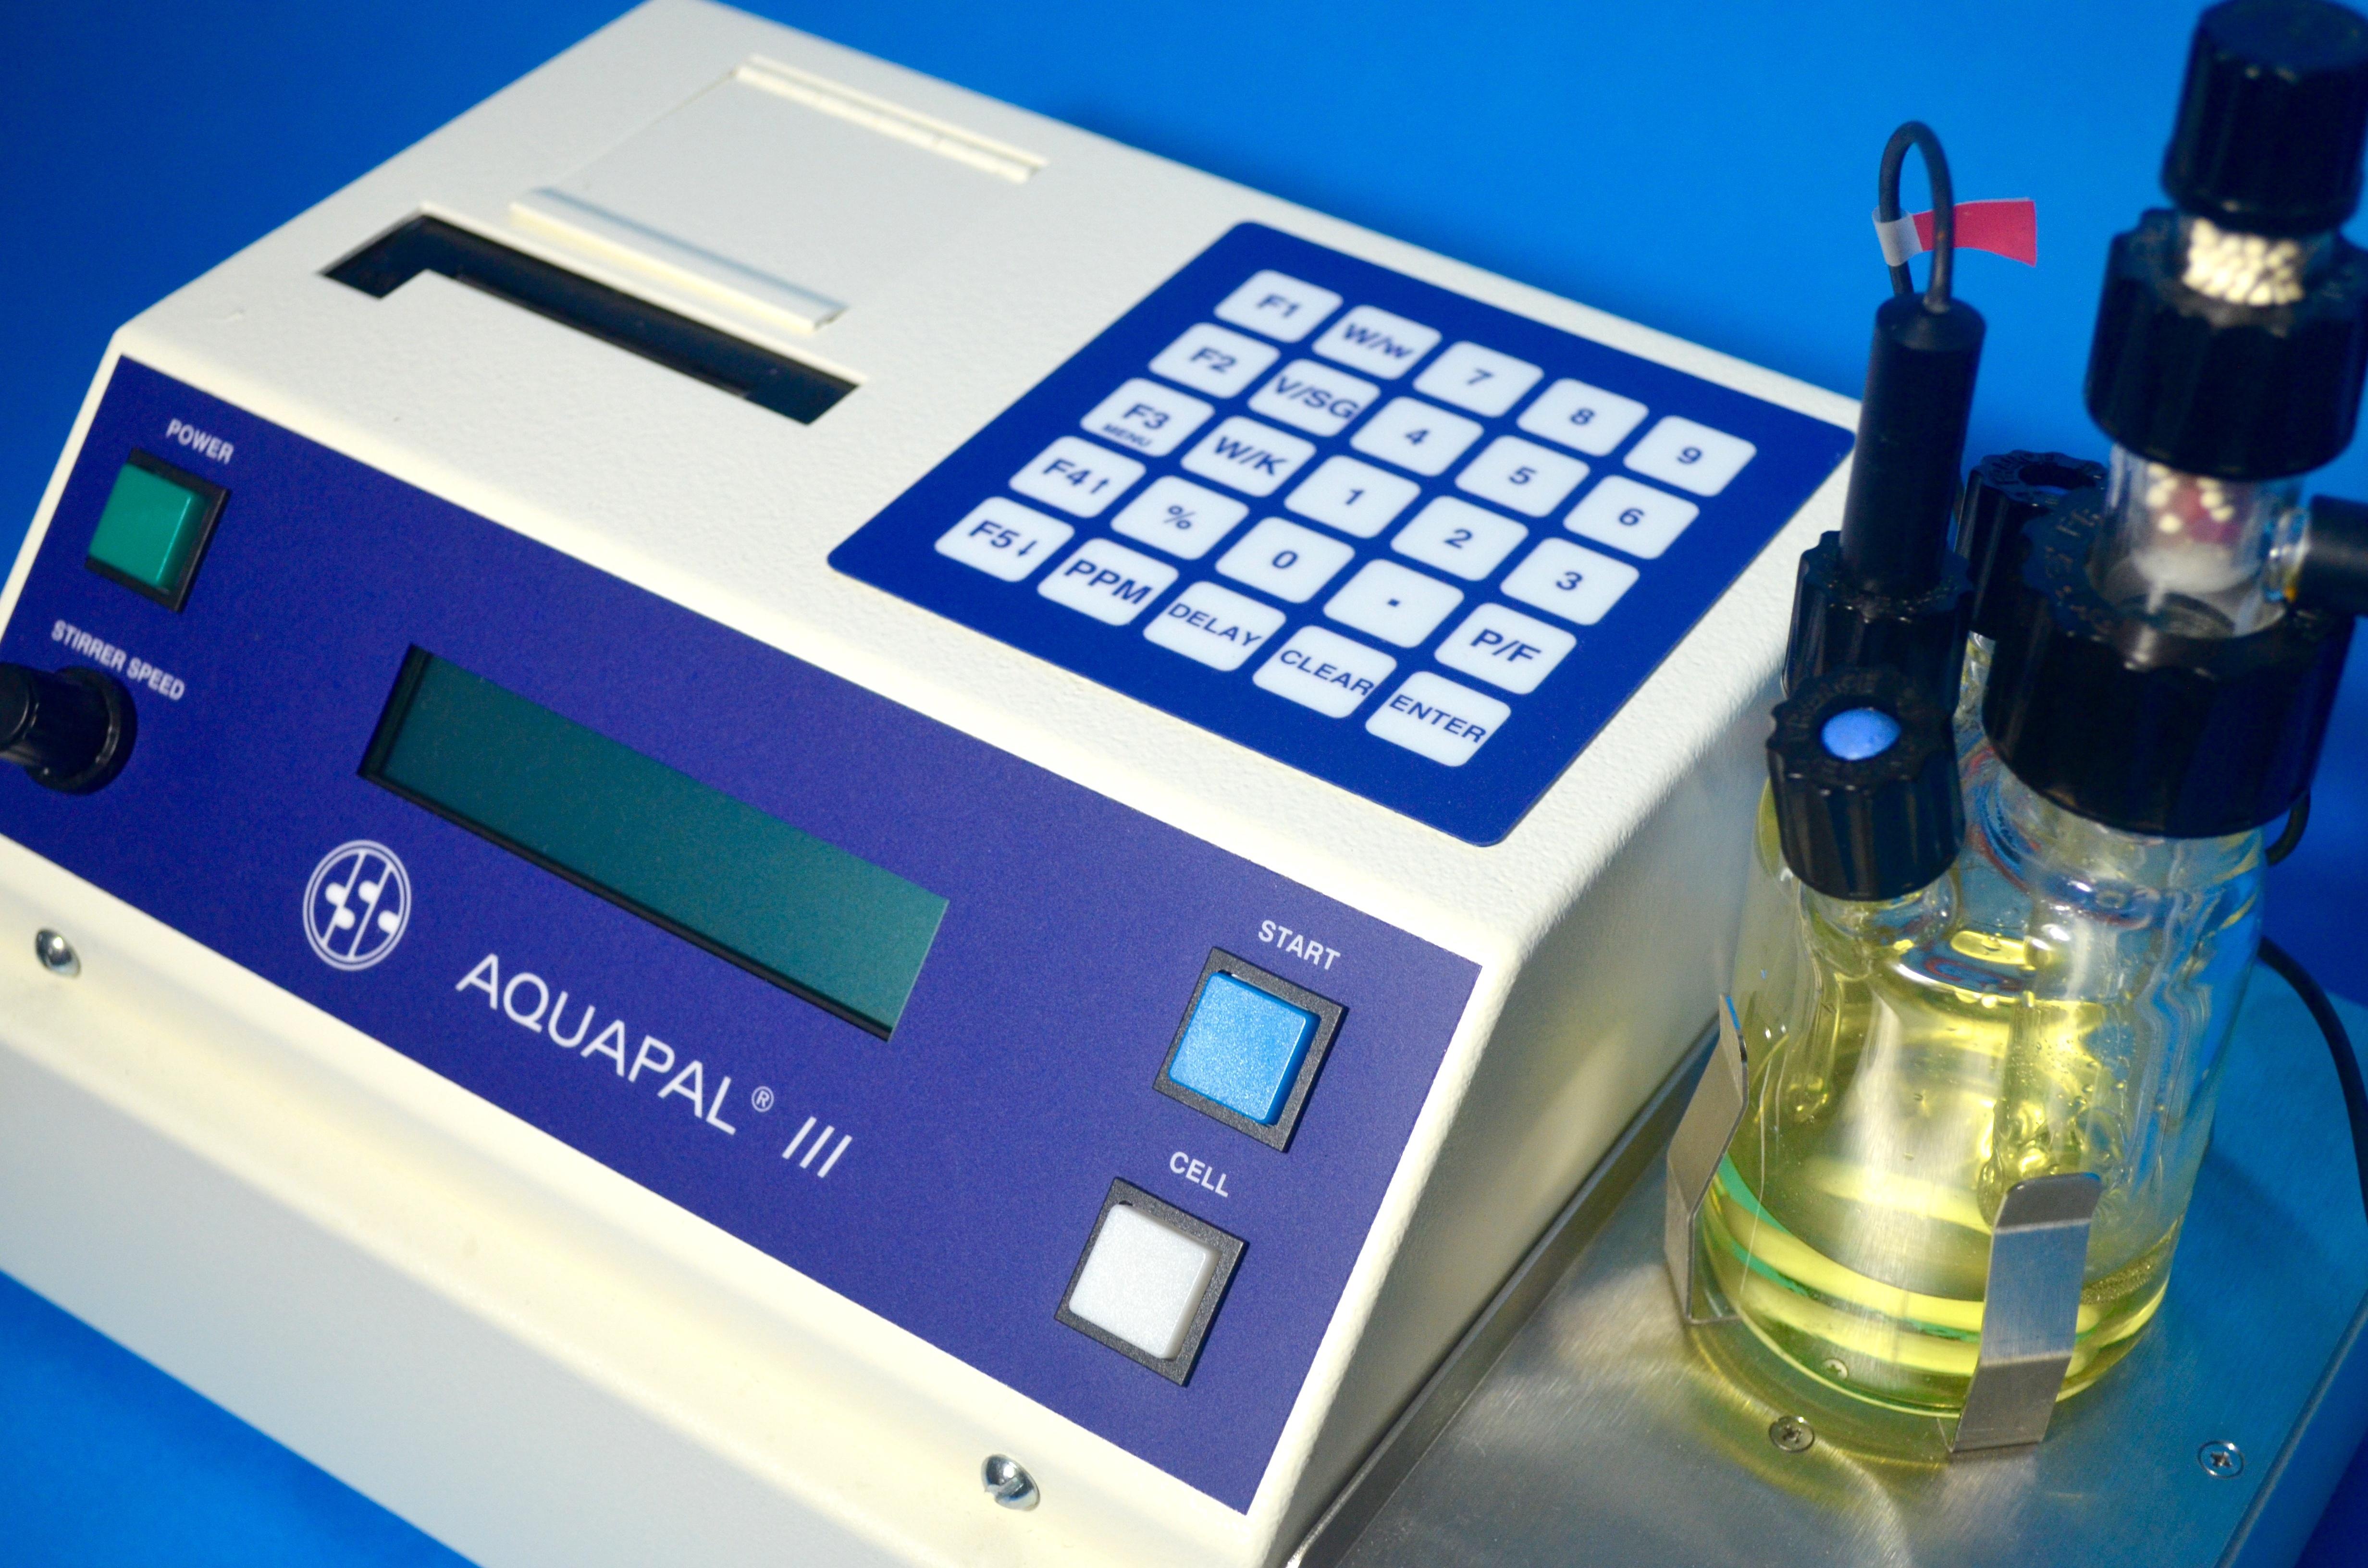 Aquapal-close-up.jpg